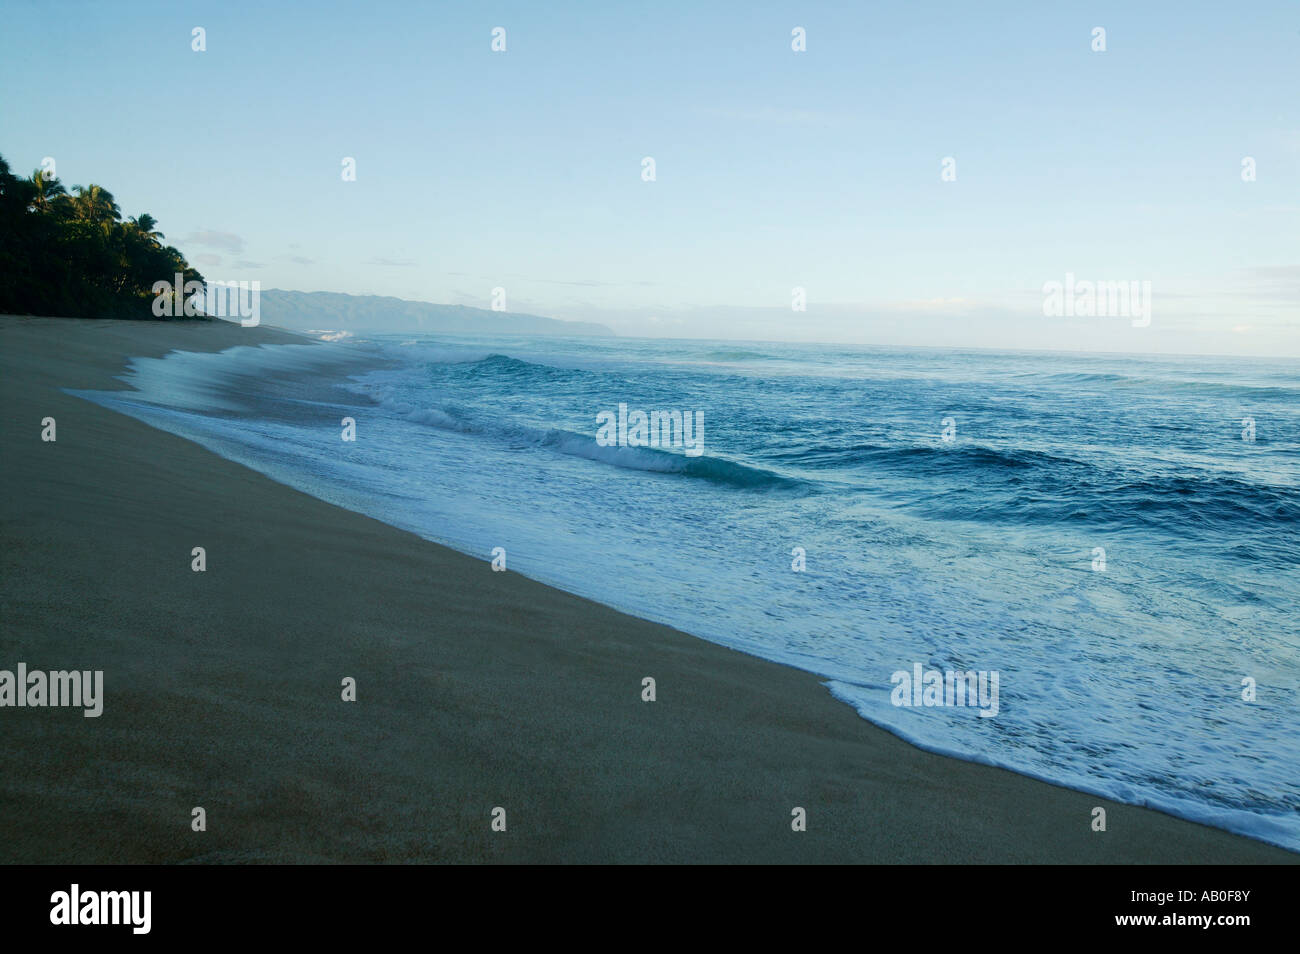 A scenic beach - Stock Image